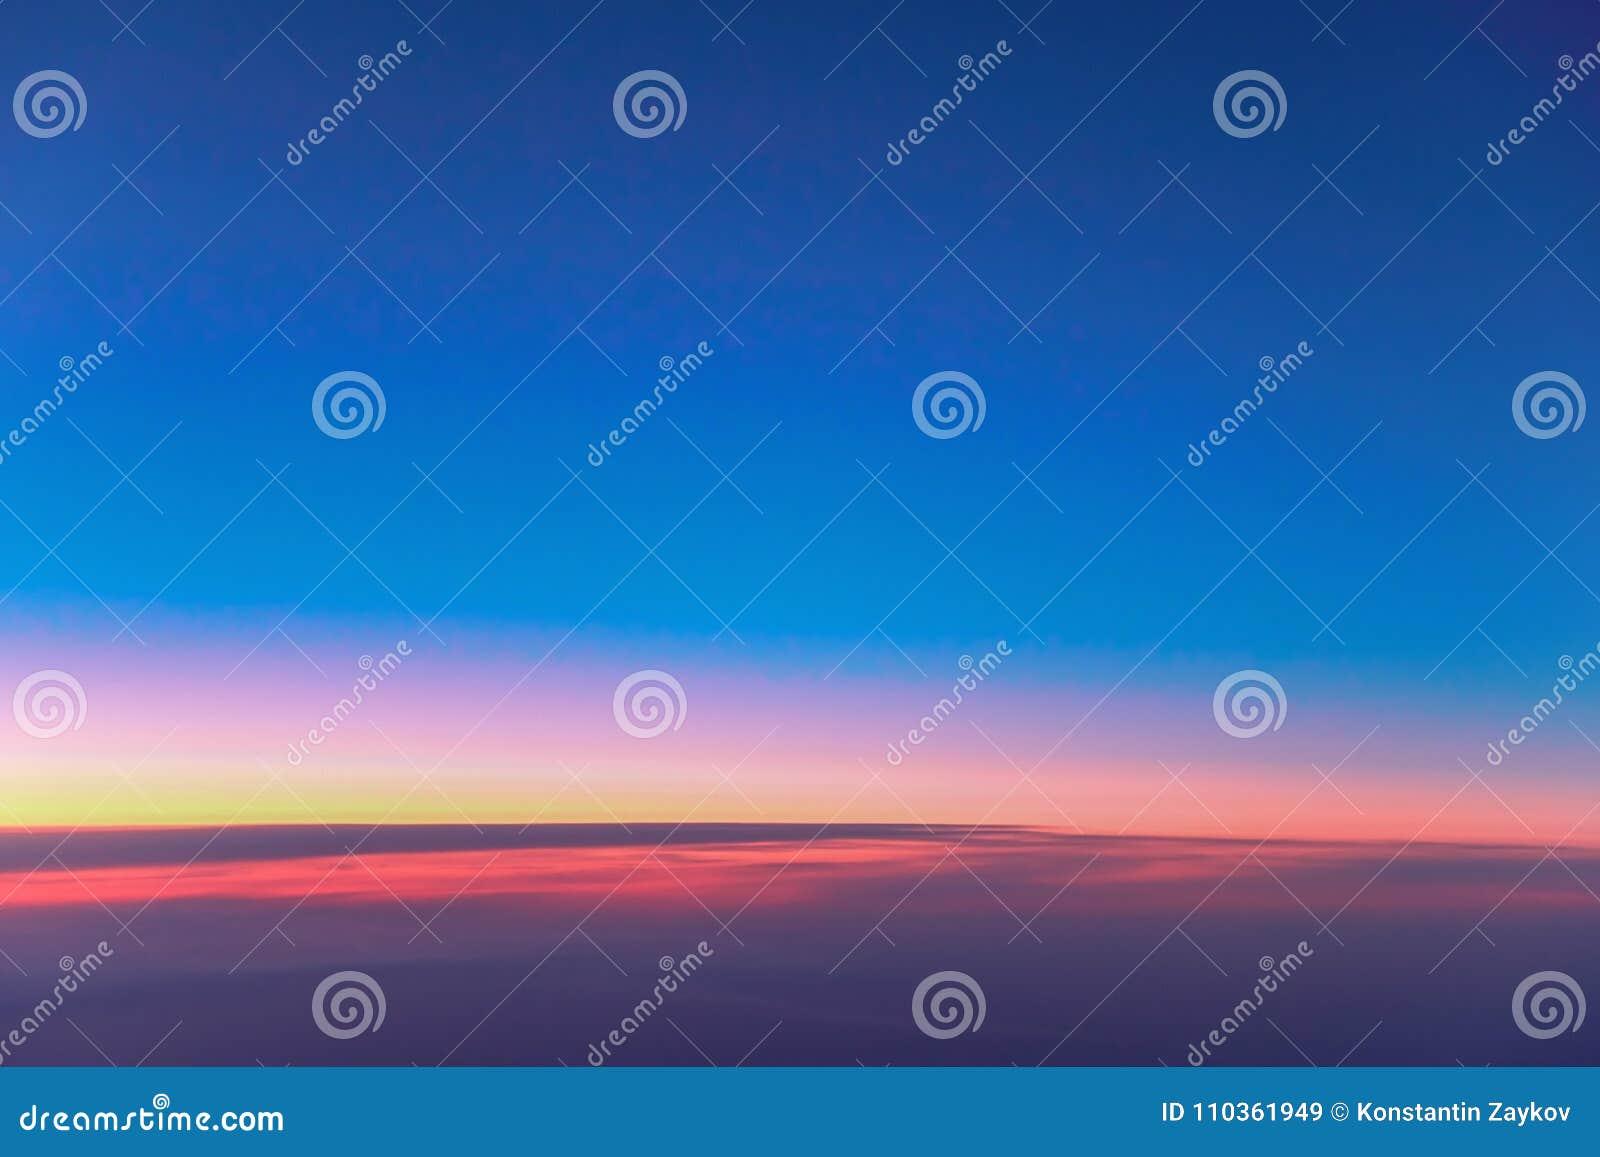 Landscape Sunrise Above Clouds Wallpaper Bright Red Orange